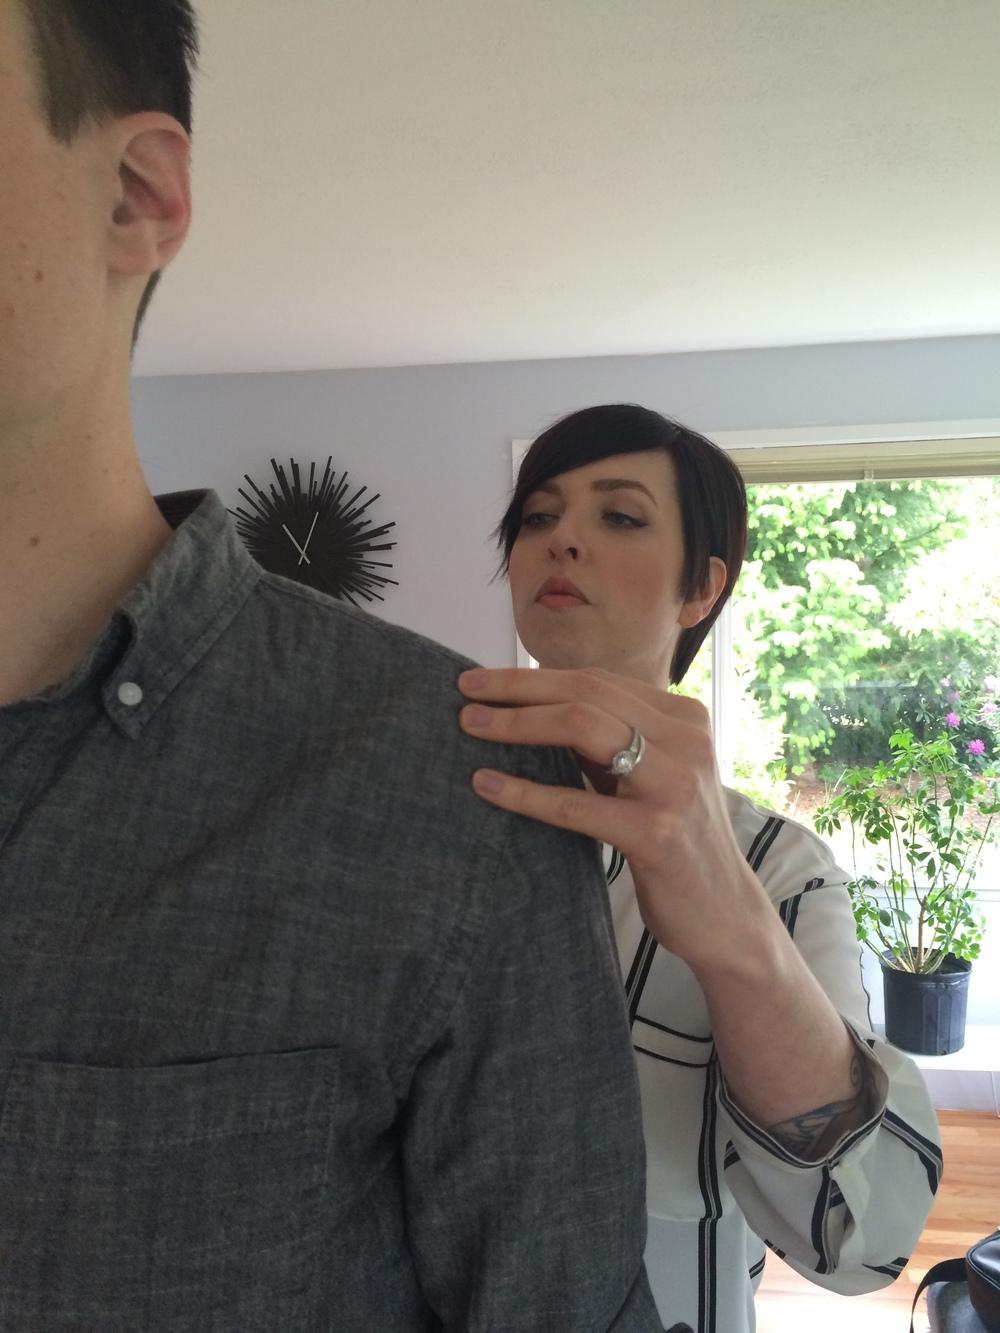 J.Hilburn stylist Ashley Bachelder taking measurements.